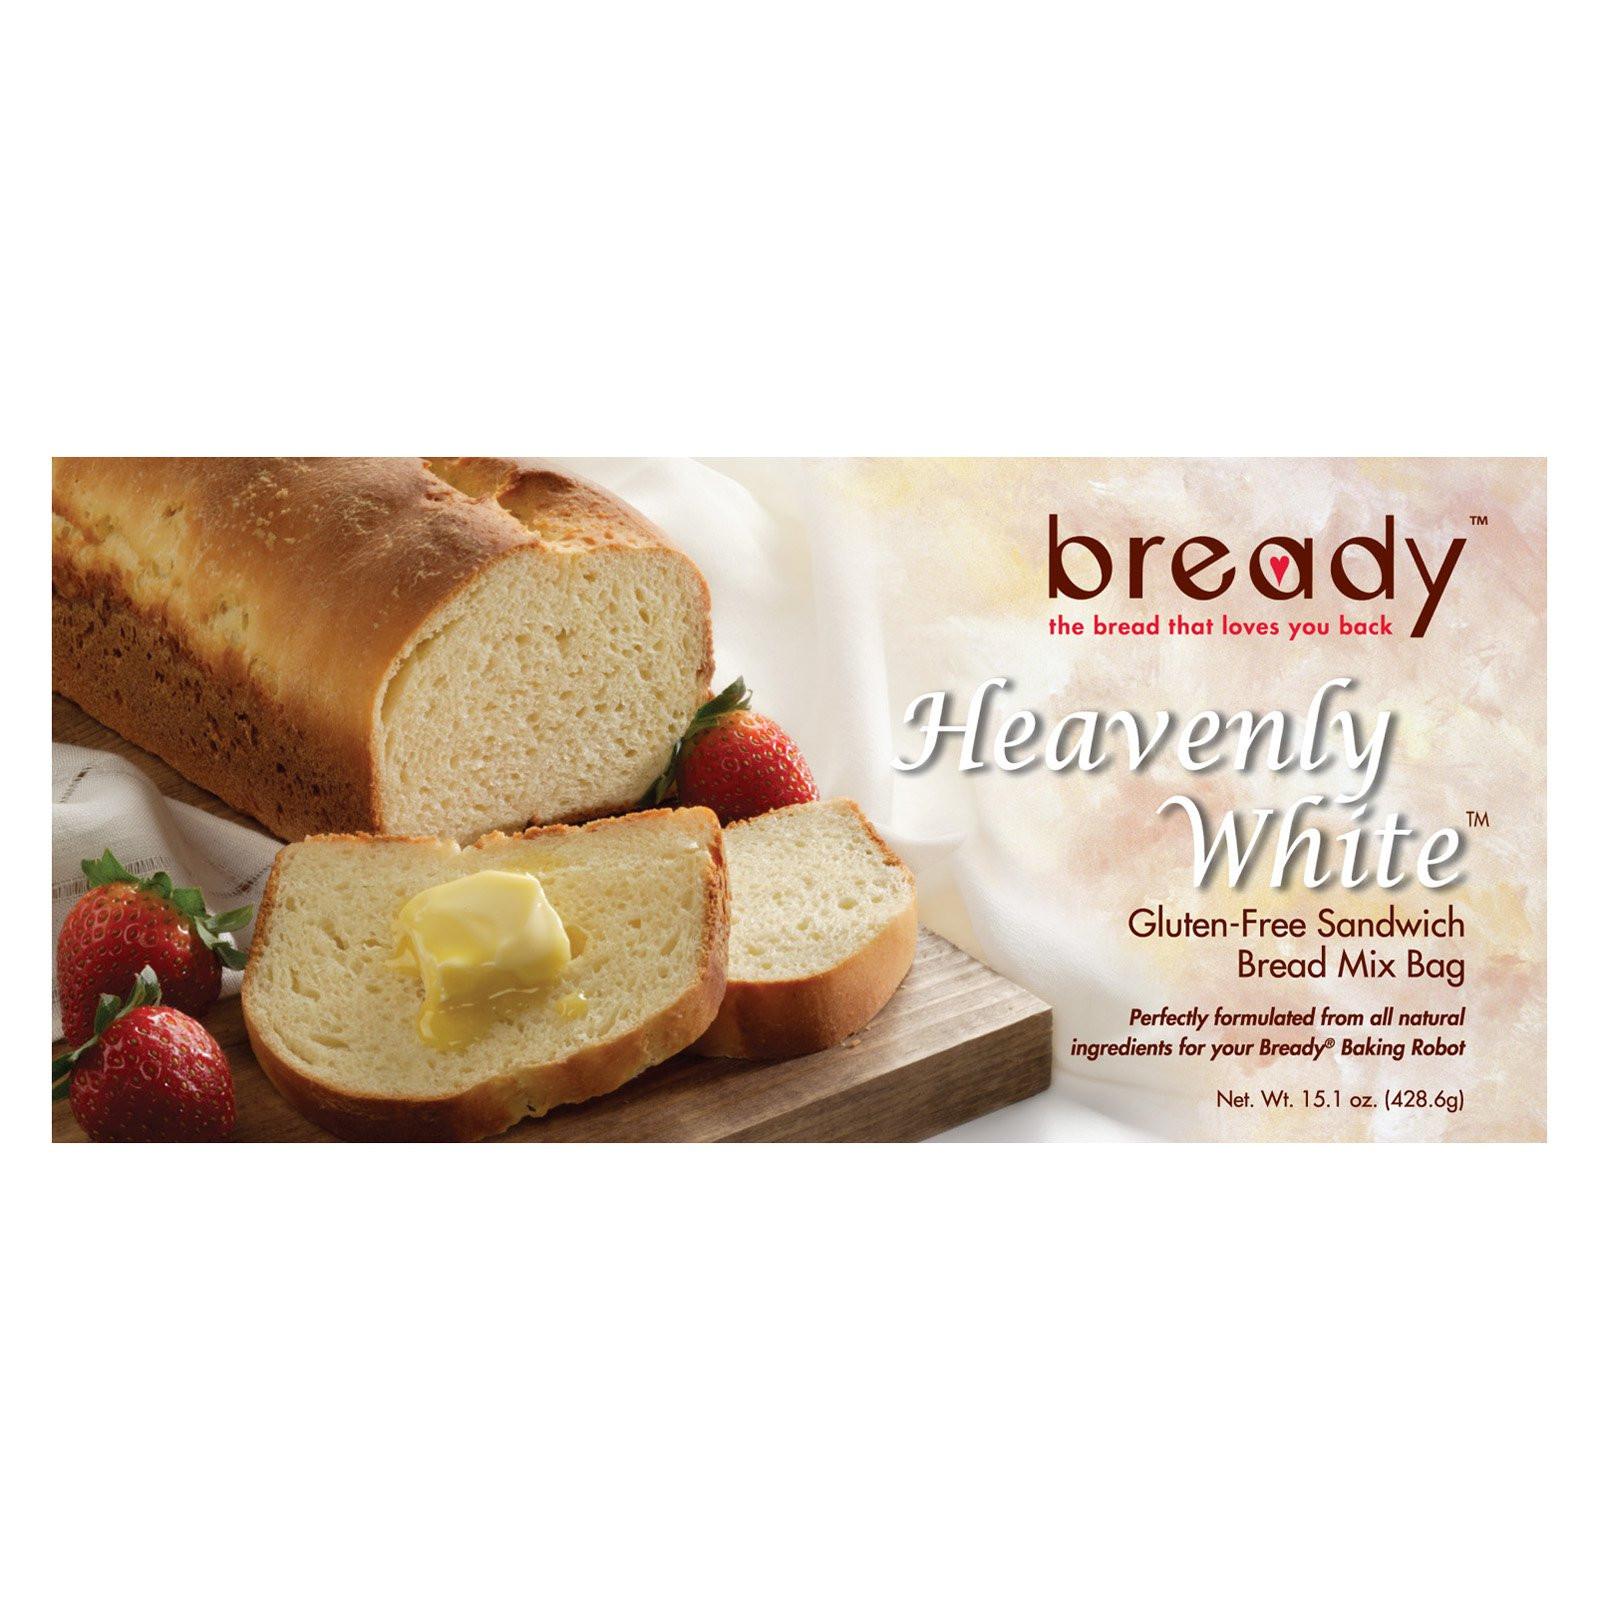 Gluten Free Bread Mix  Bready Heavenly White Gluten Free Sandwich Bread Mix at